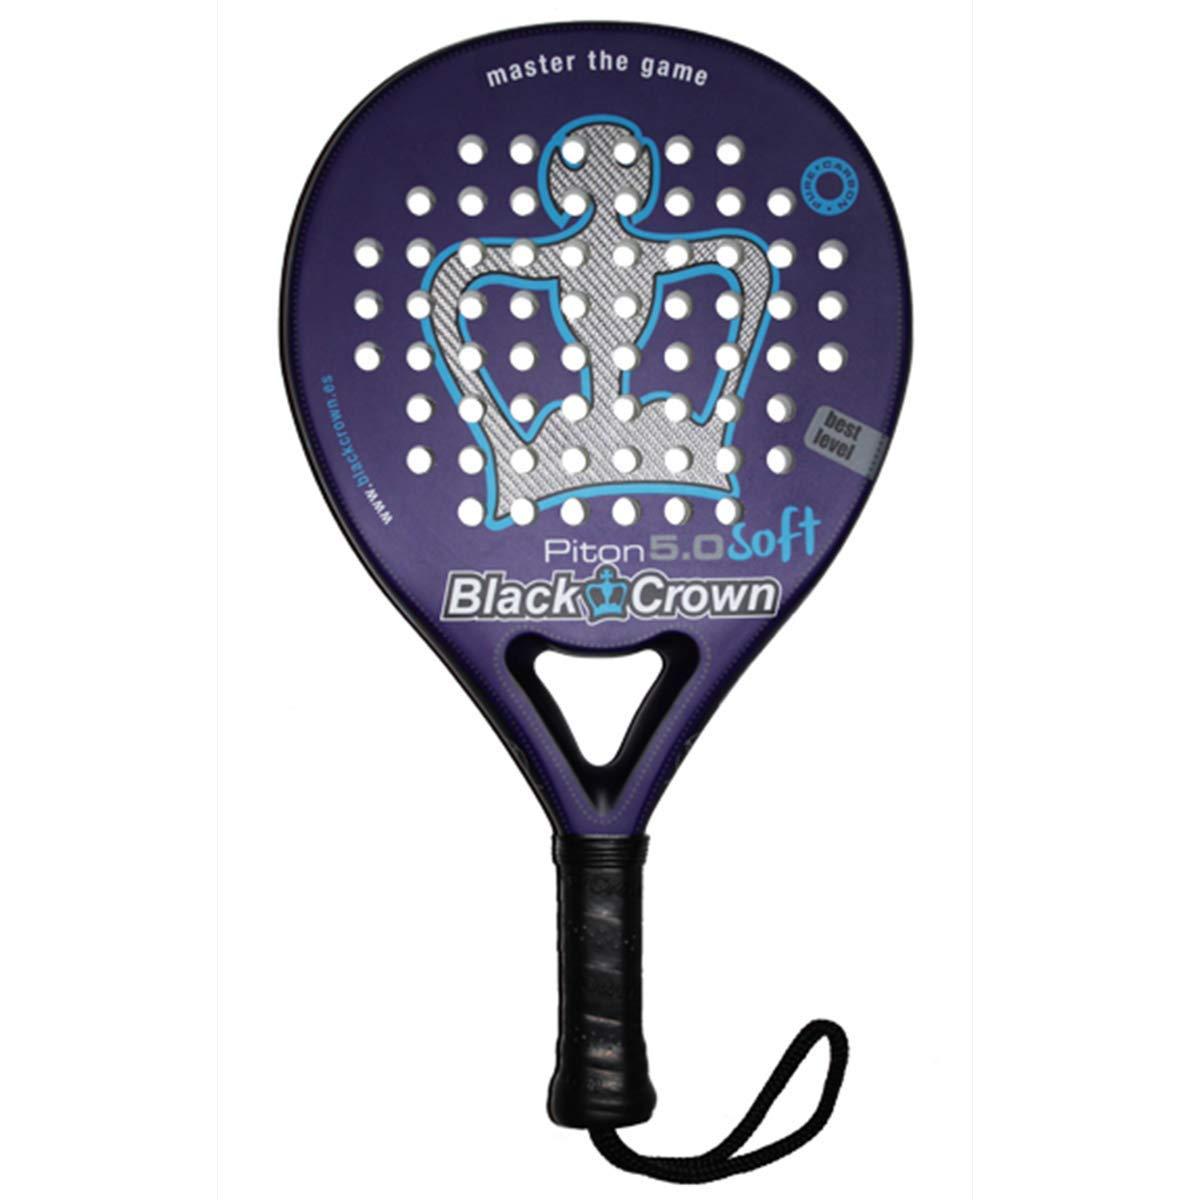 Black Crown Piton 5.0 Soft, Adultos Unisex, Multicolor, Talla ...